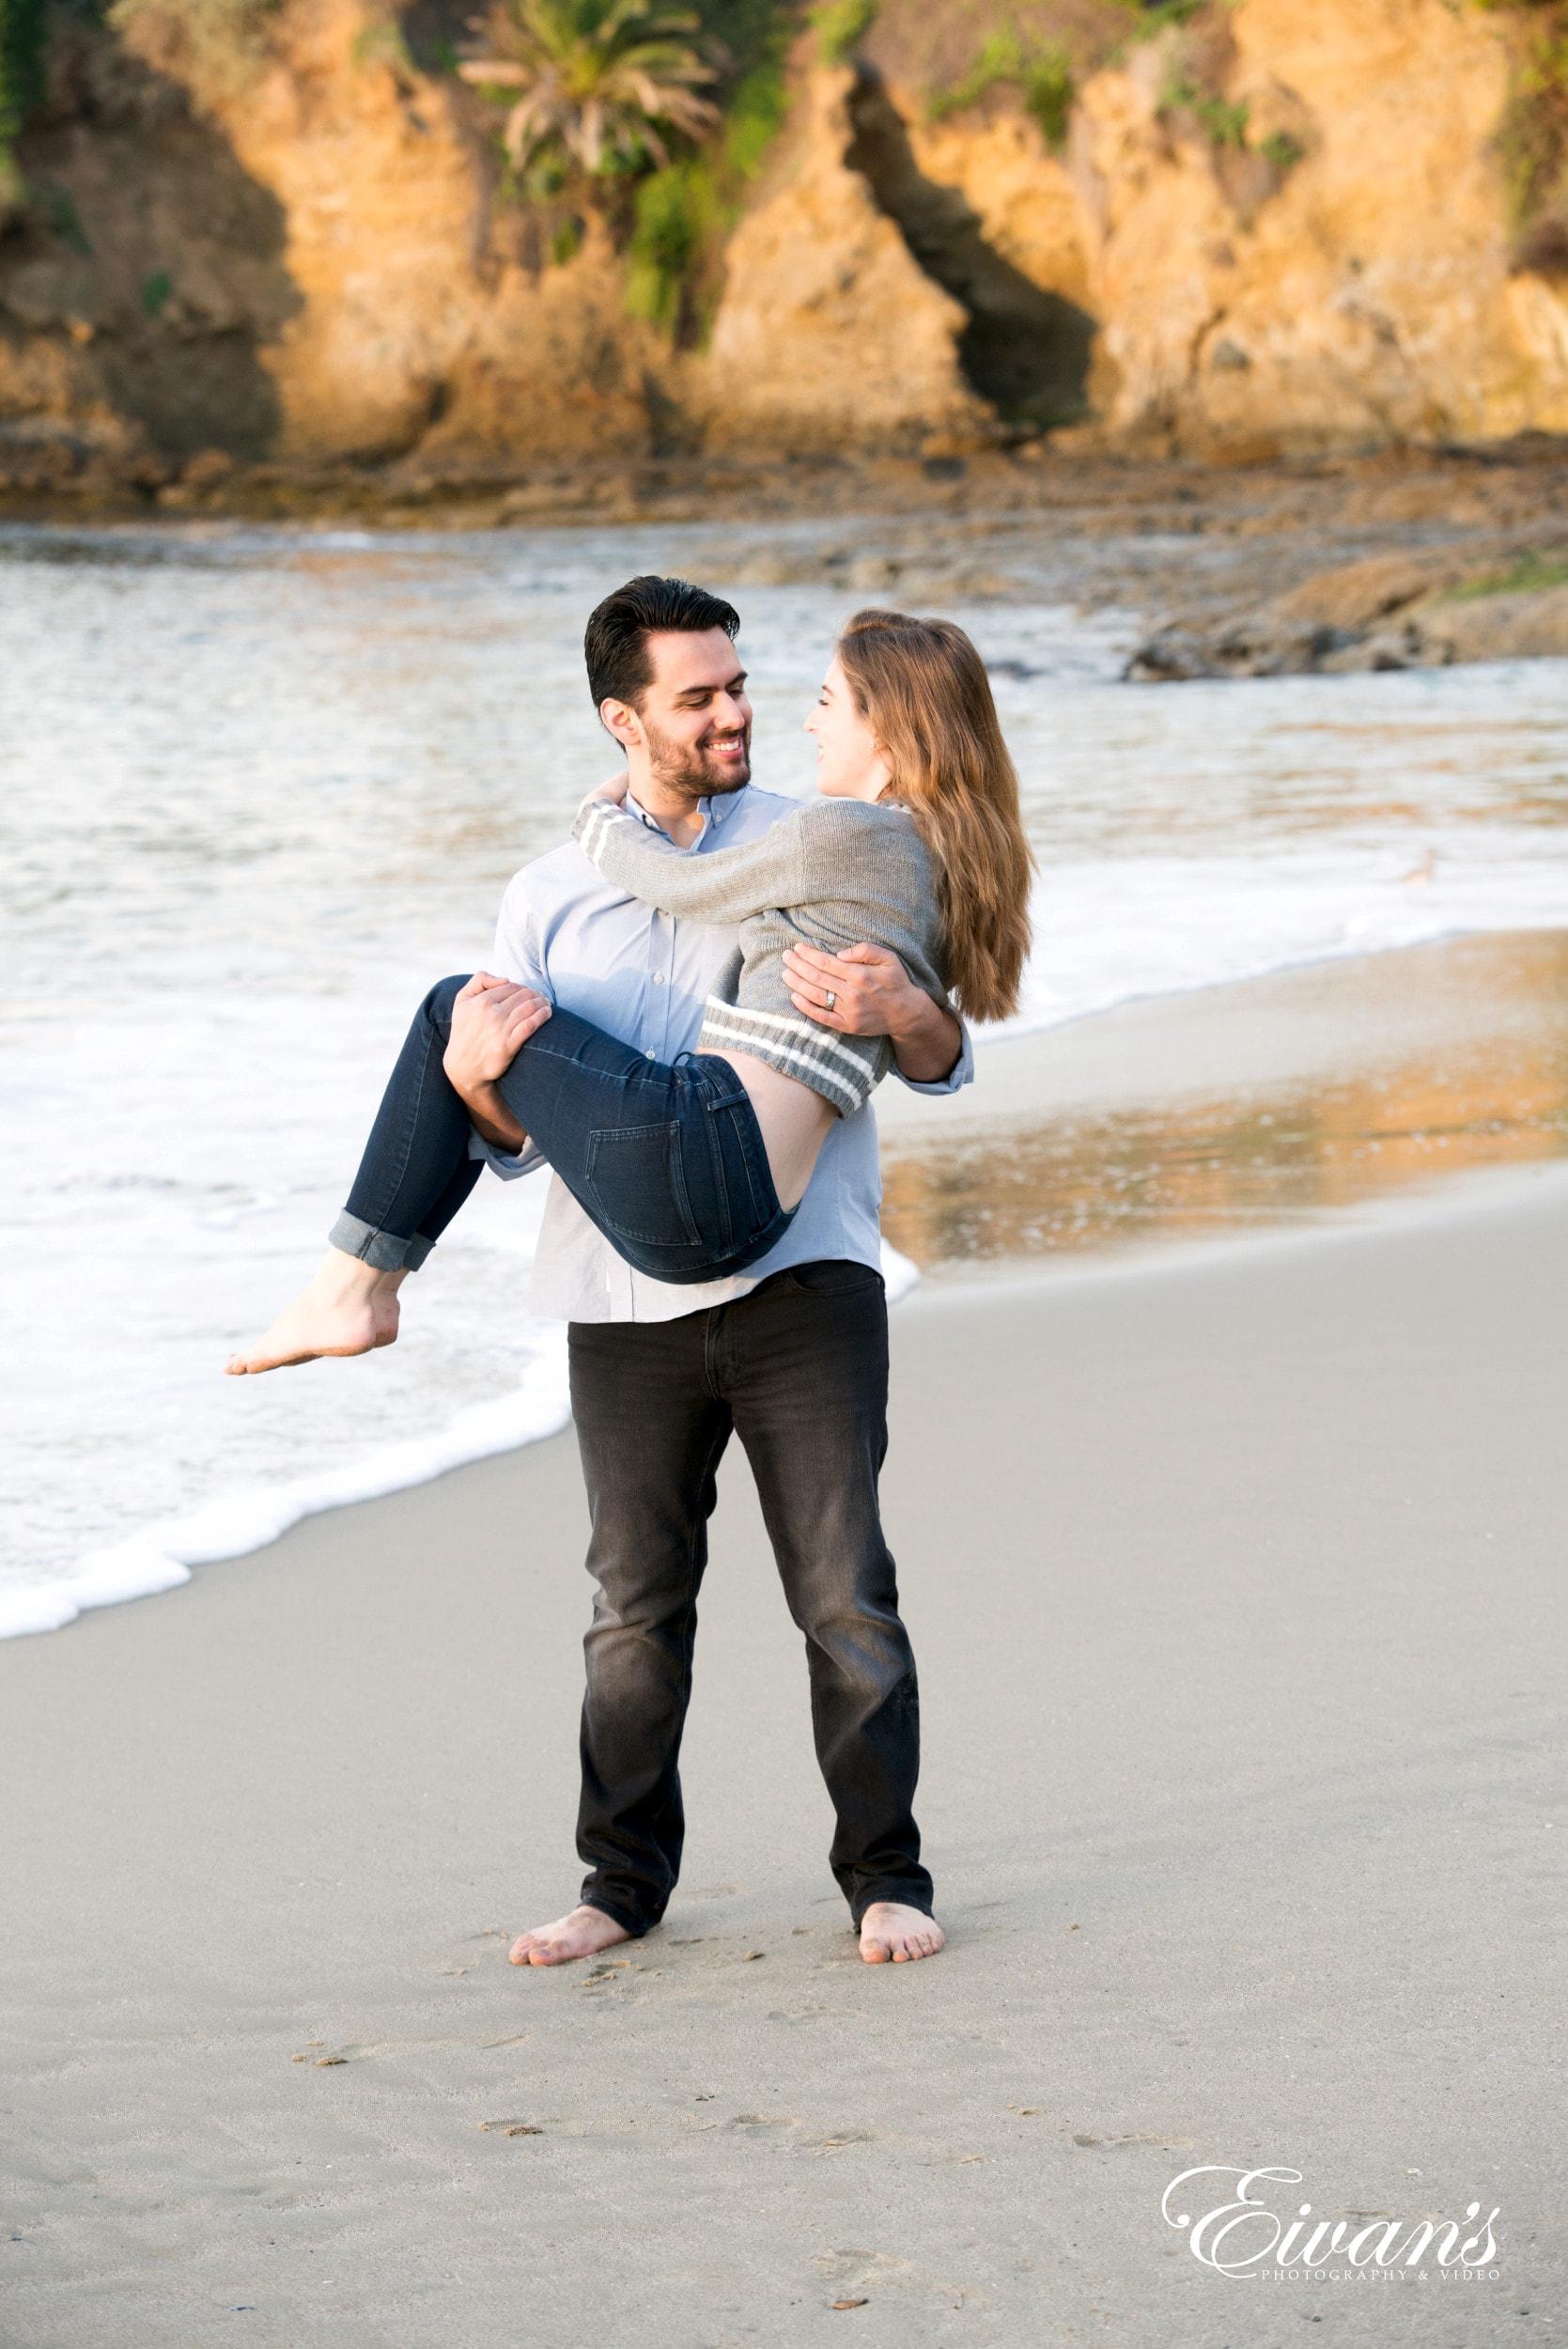 man in white long sleeve shirt hugging woman in white long sleeve shirt on beach during